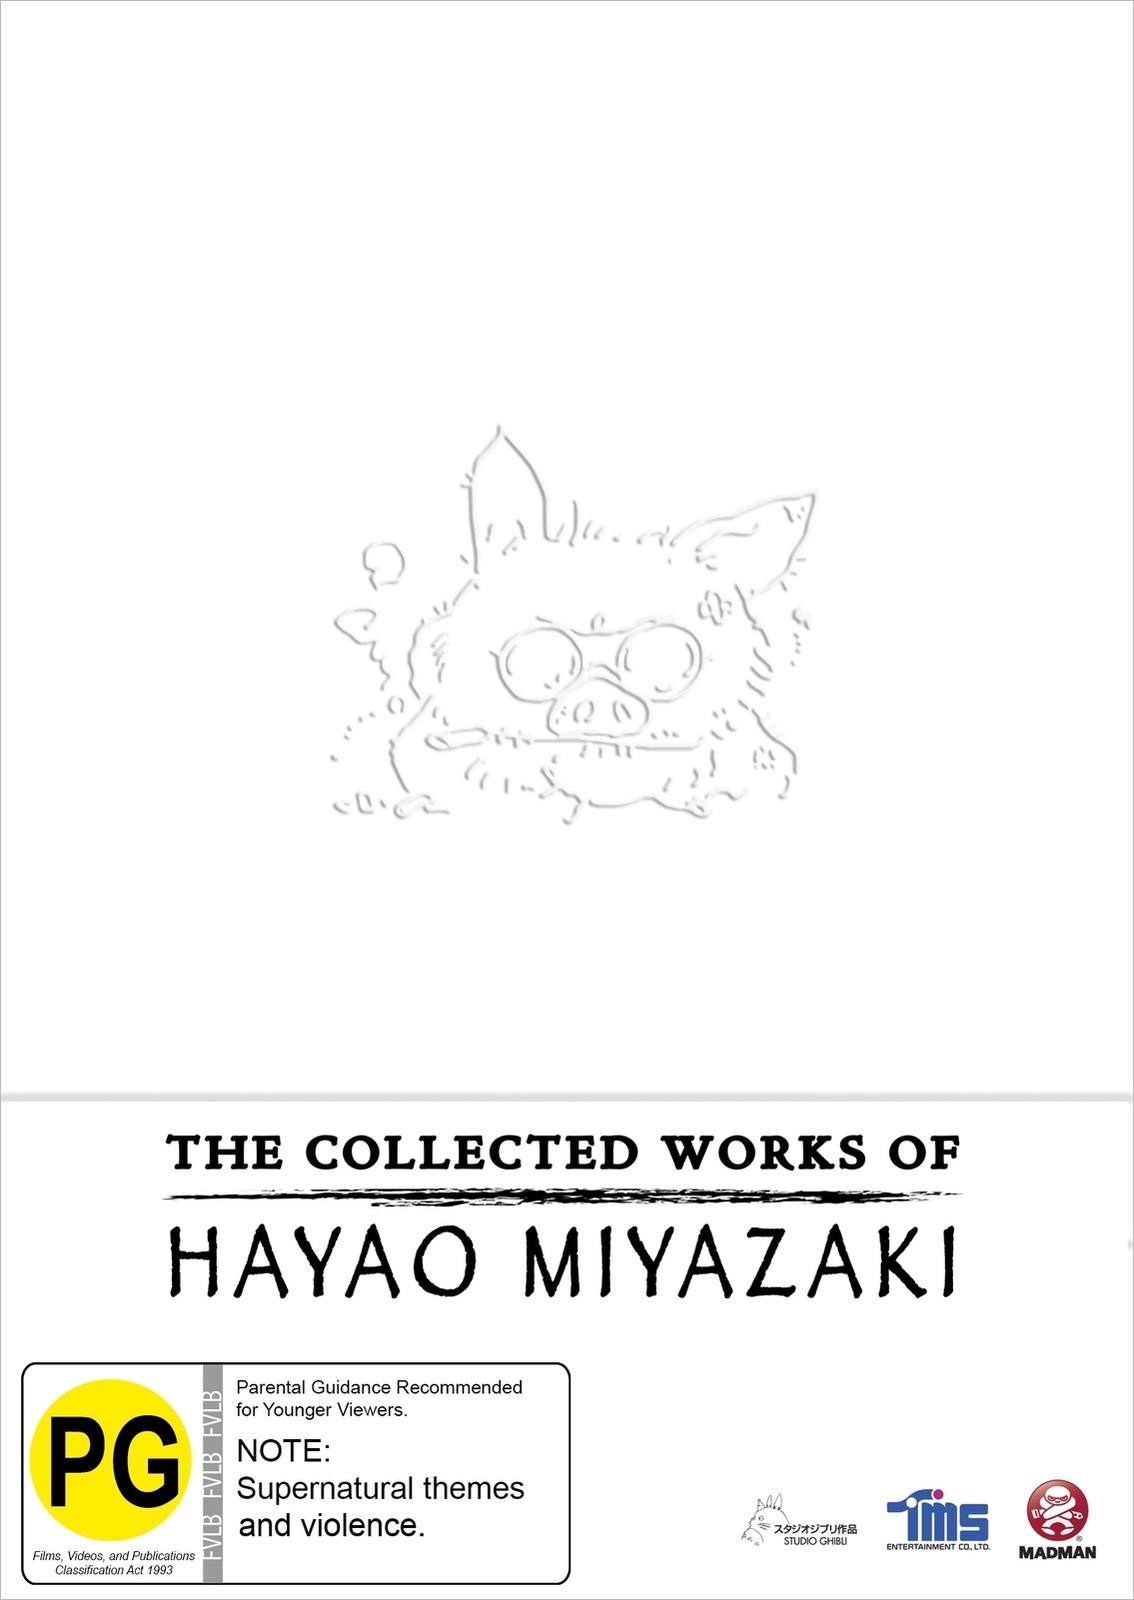 The Collected Works of Hayao Miyazaki Box Set on Blu-ray image